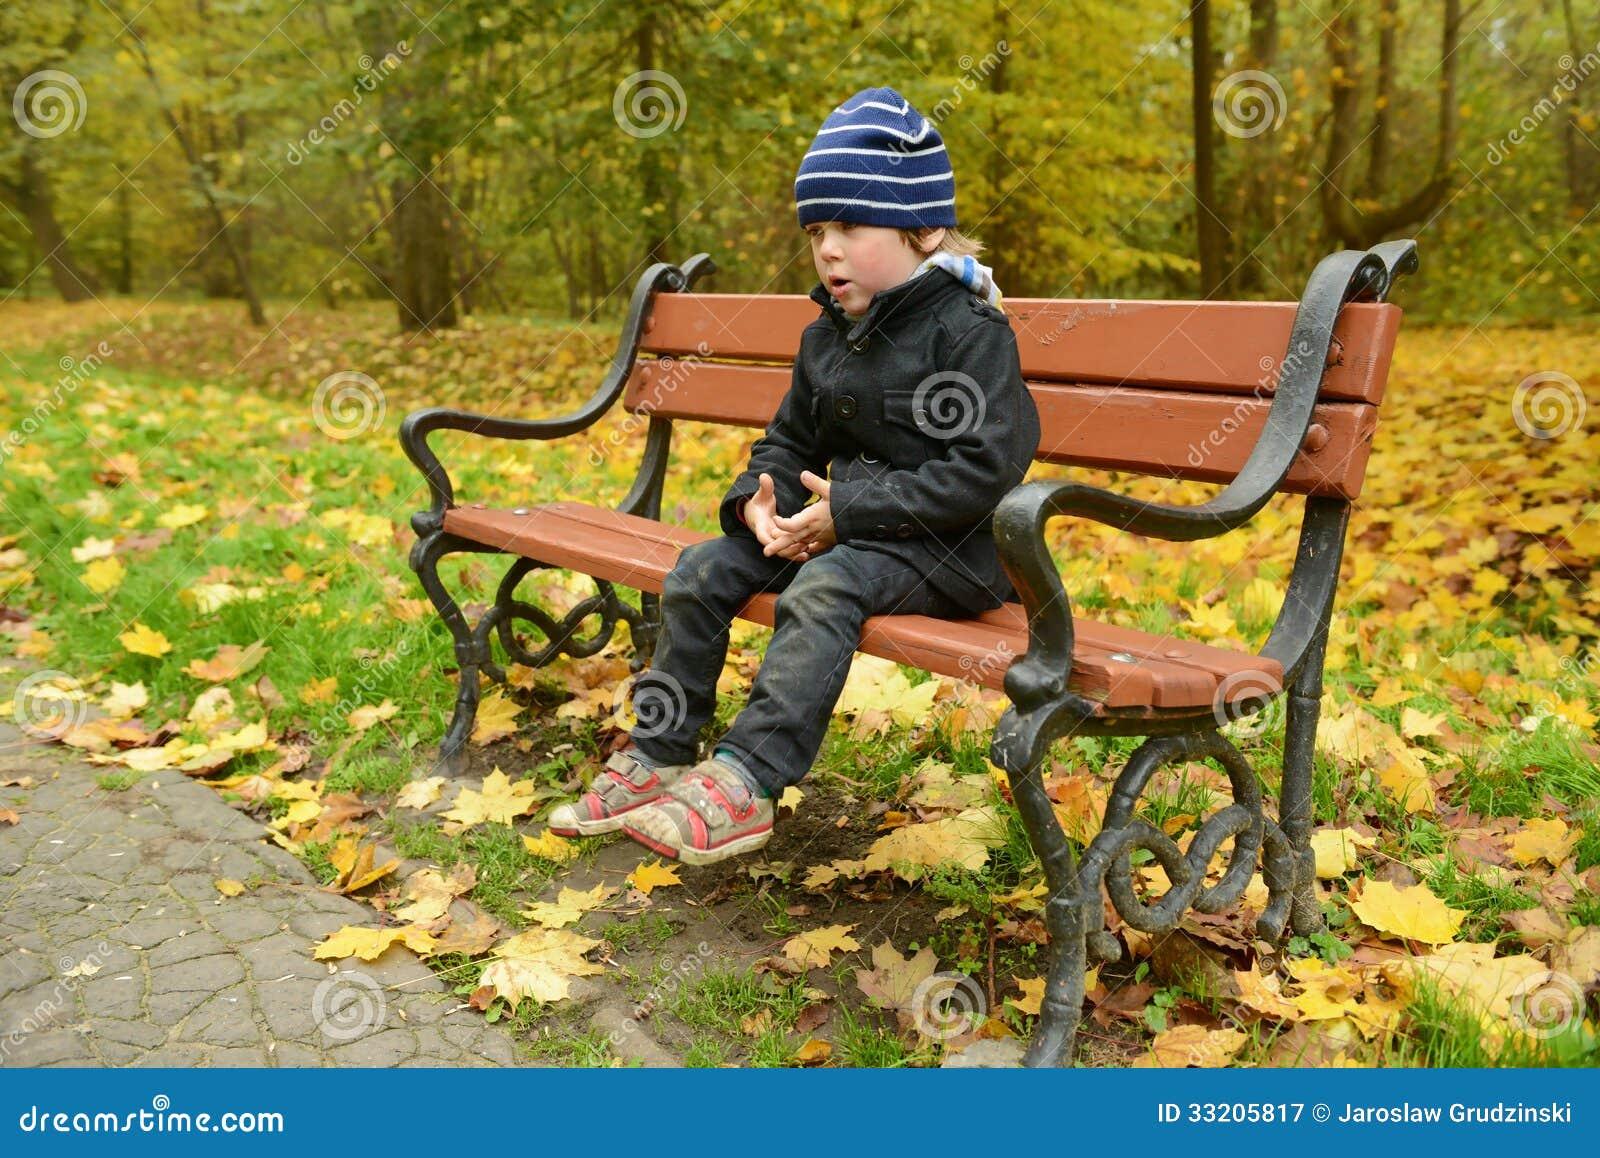 Little boy in the park in autumn